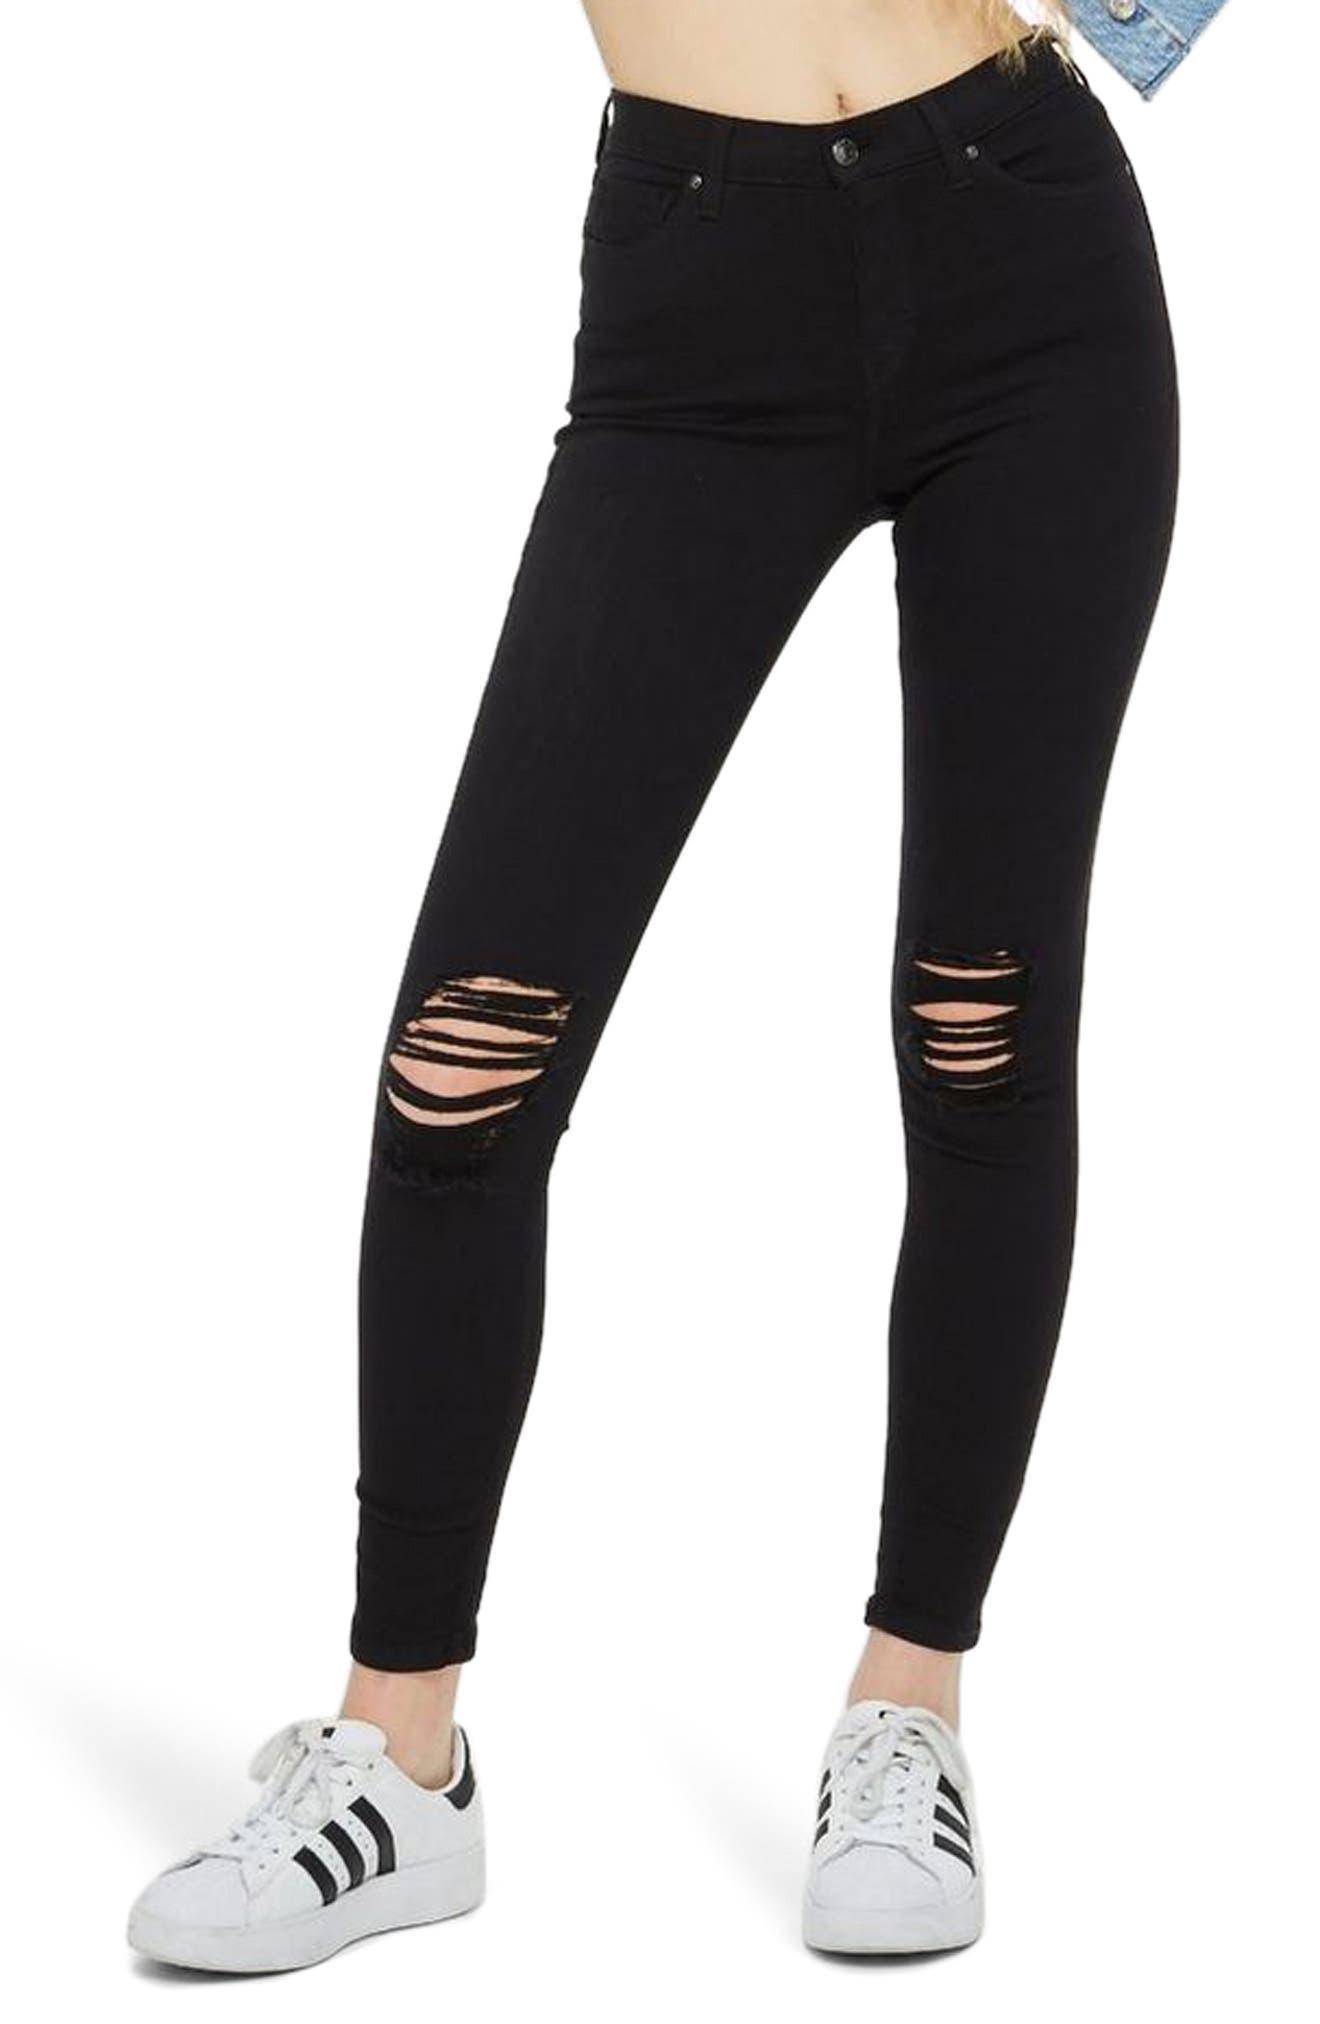 Topshop Moto Jamie High Waist Ripped Black Jeans (Regular & Petite)